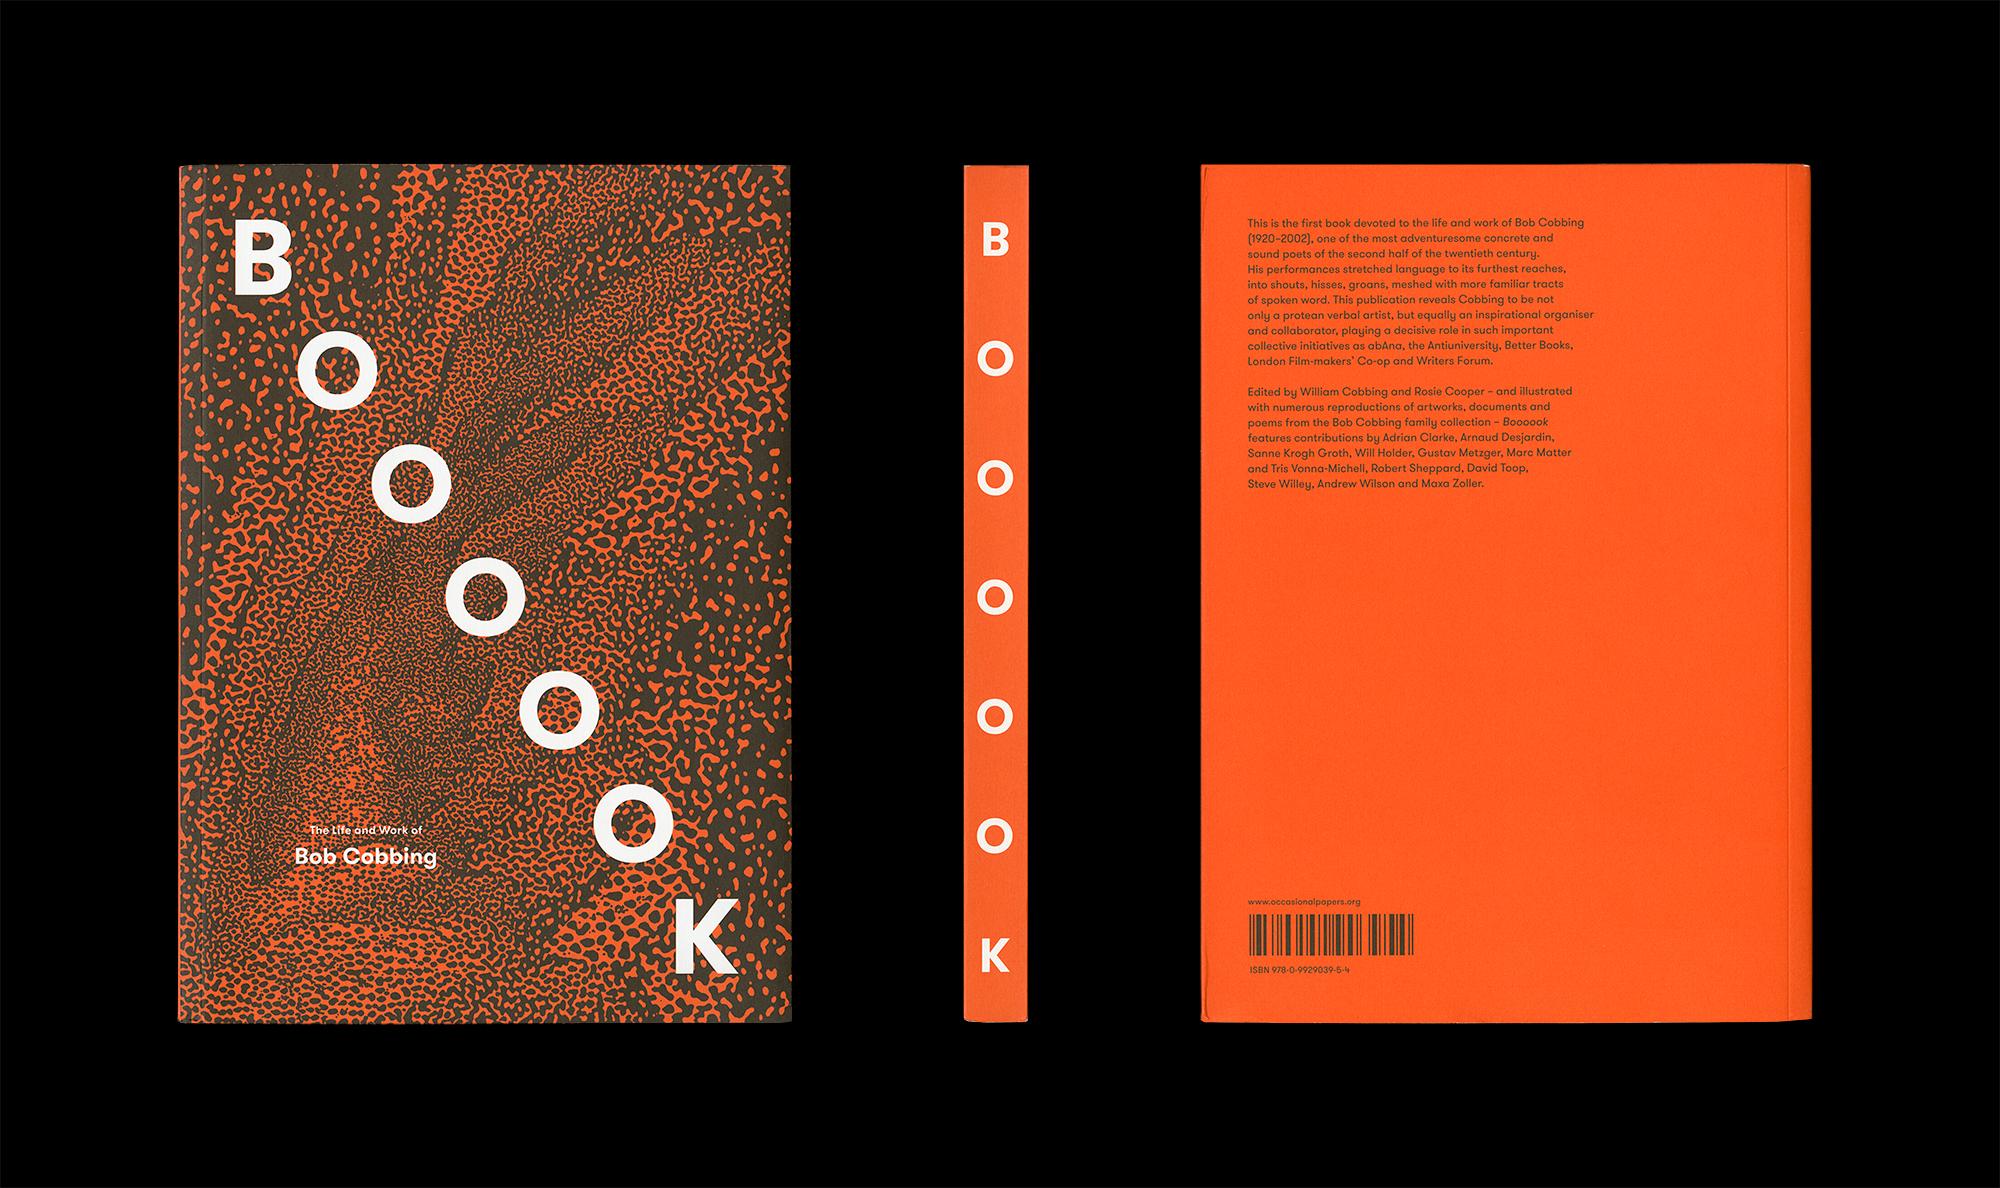 BOOOOOK_003_combined_sd